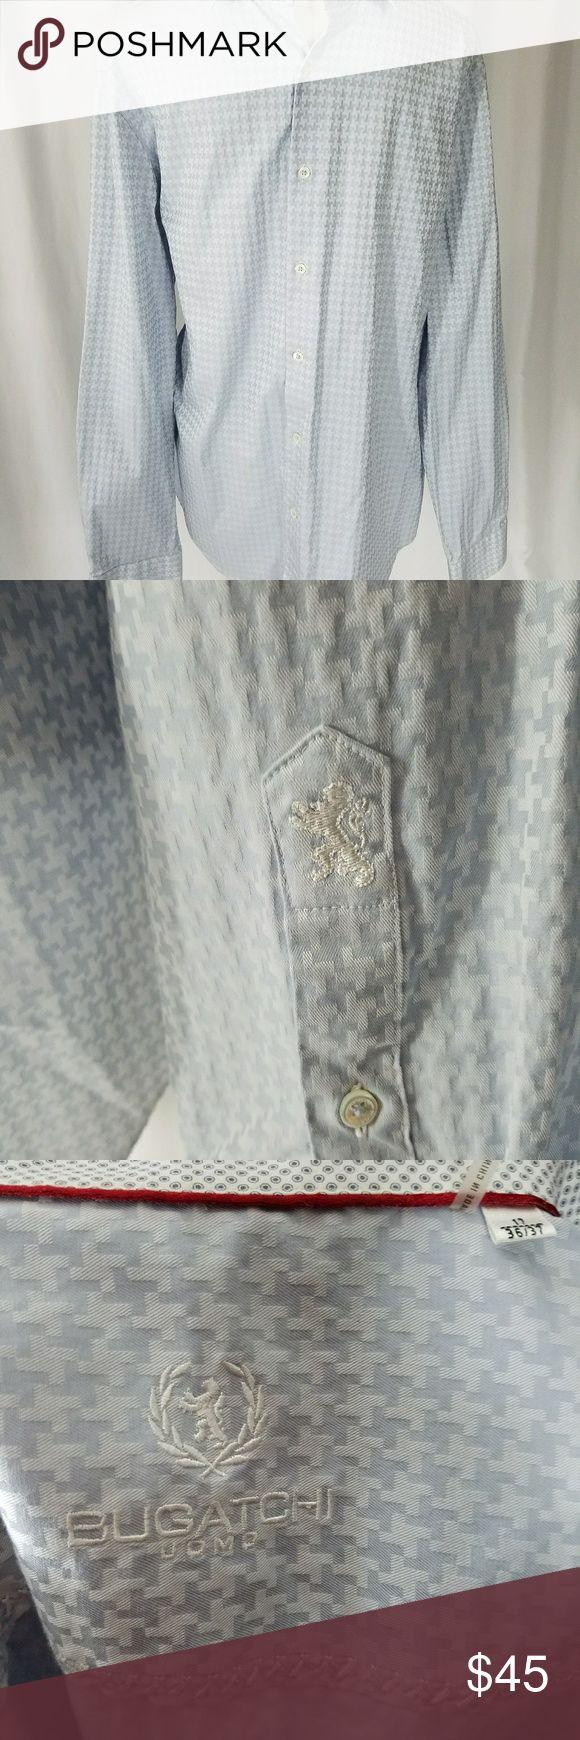 Mens Bugatchi Blue Asymmetrical Shirt 17 36/37 Mens buttoned down Bugatchi shirt size 17 36/37. Like new condition. Has Bugatchi symbol on sleeves near cuff.  I bundle all items please ask,thanks again a468 Bugatchi Shirts Dress Shirts